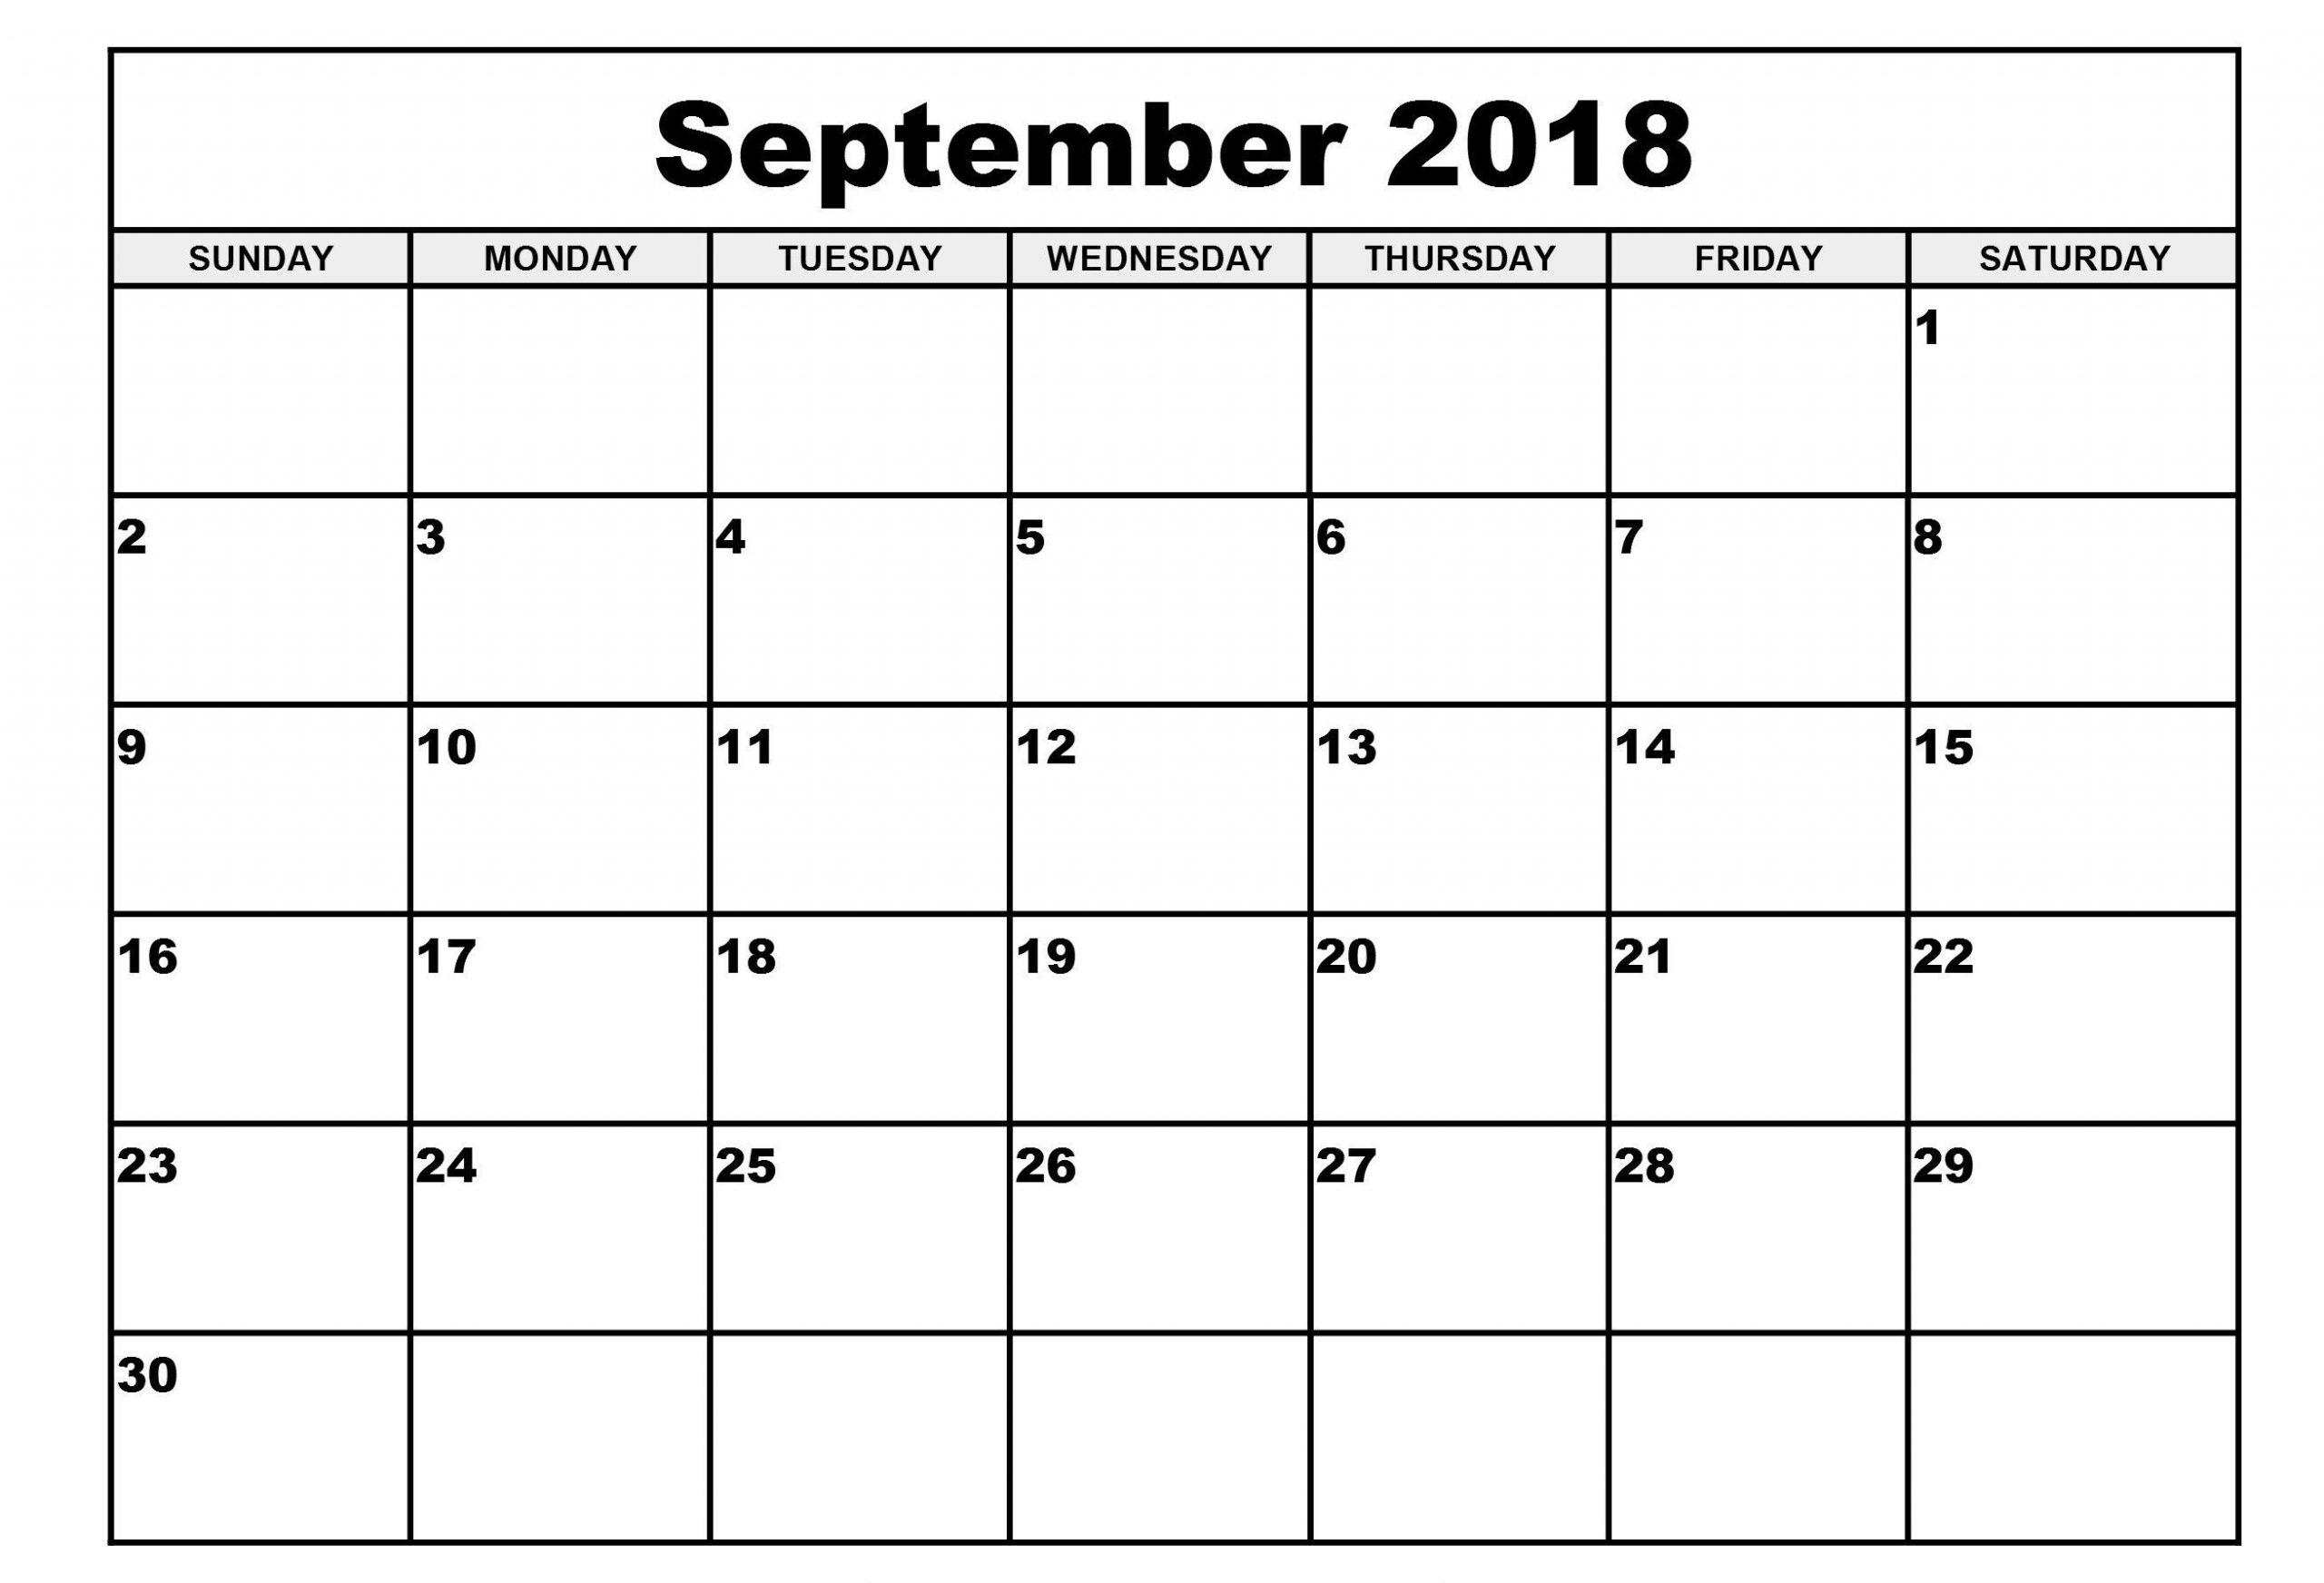 September 2018 Calendar Spanish Word Excel Pdf | Calendar